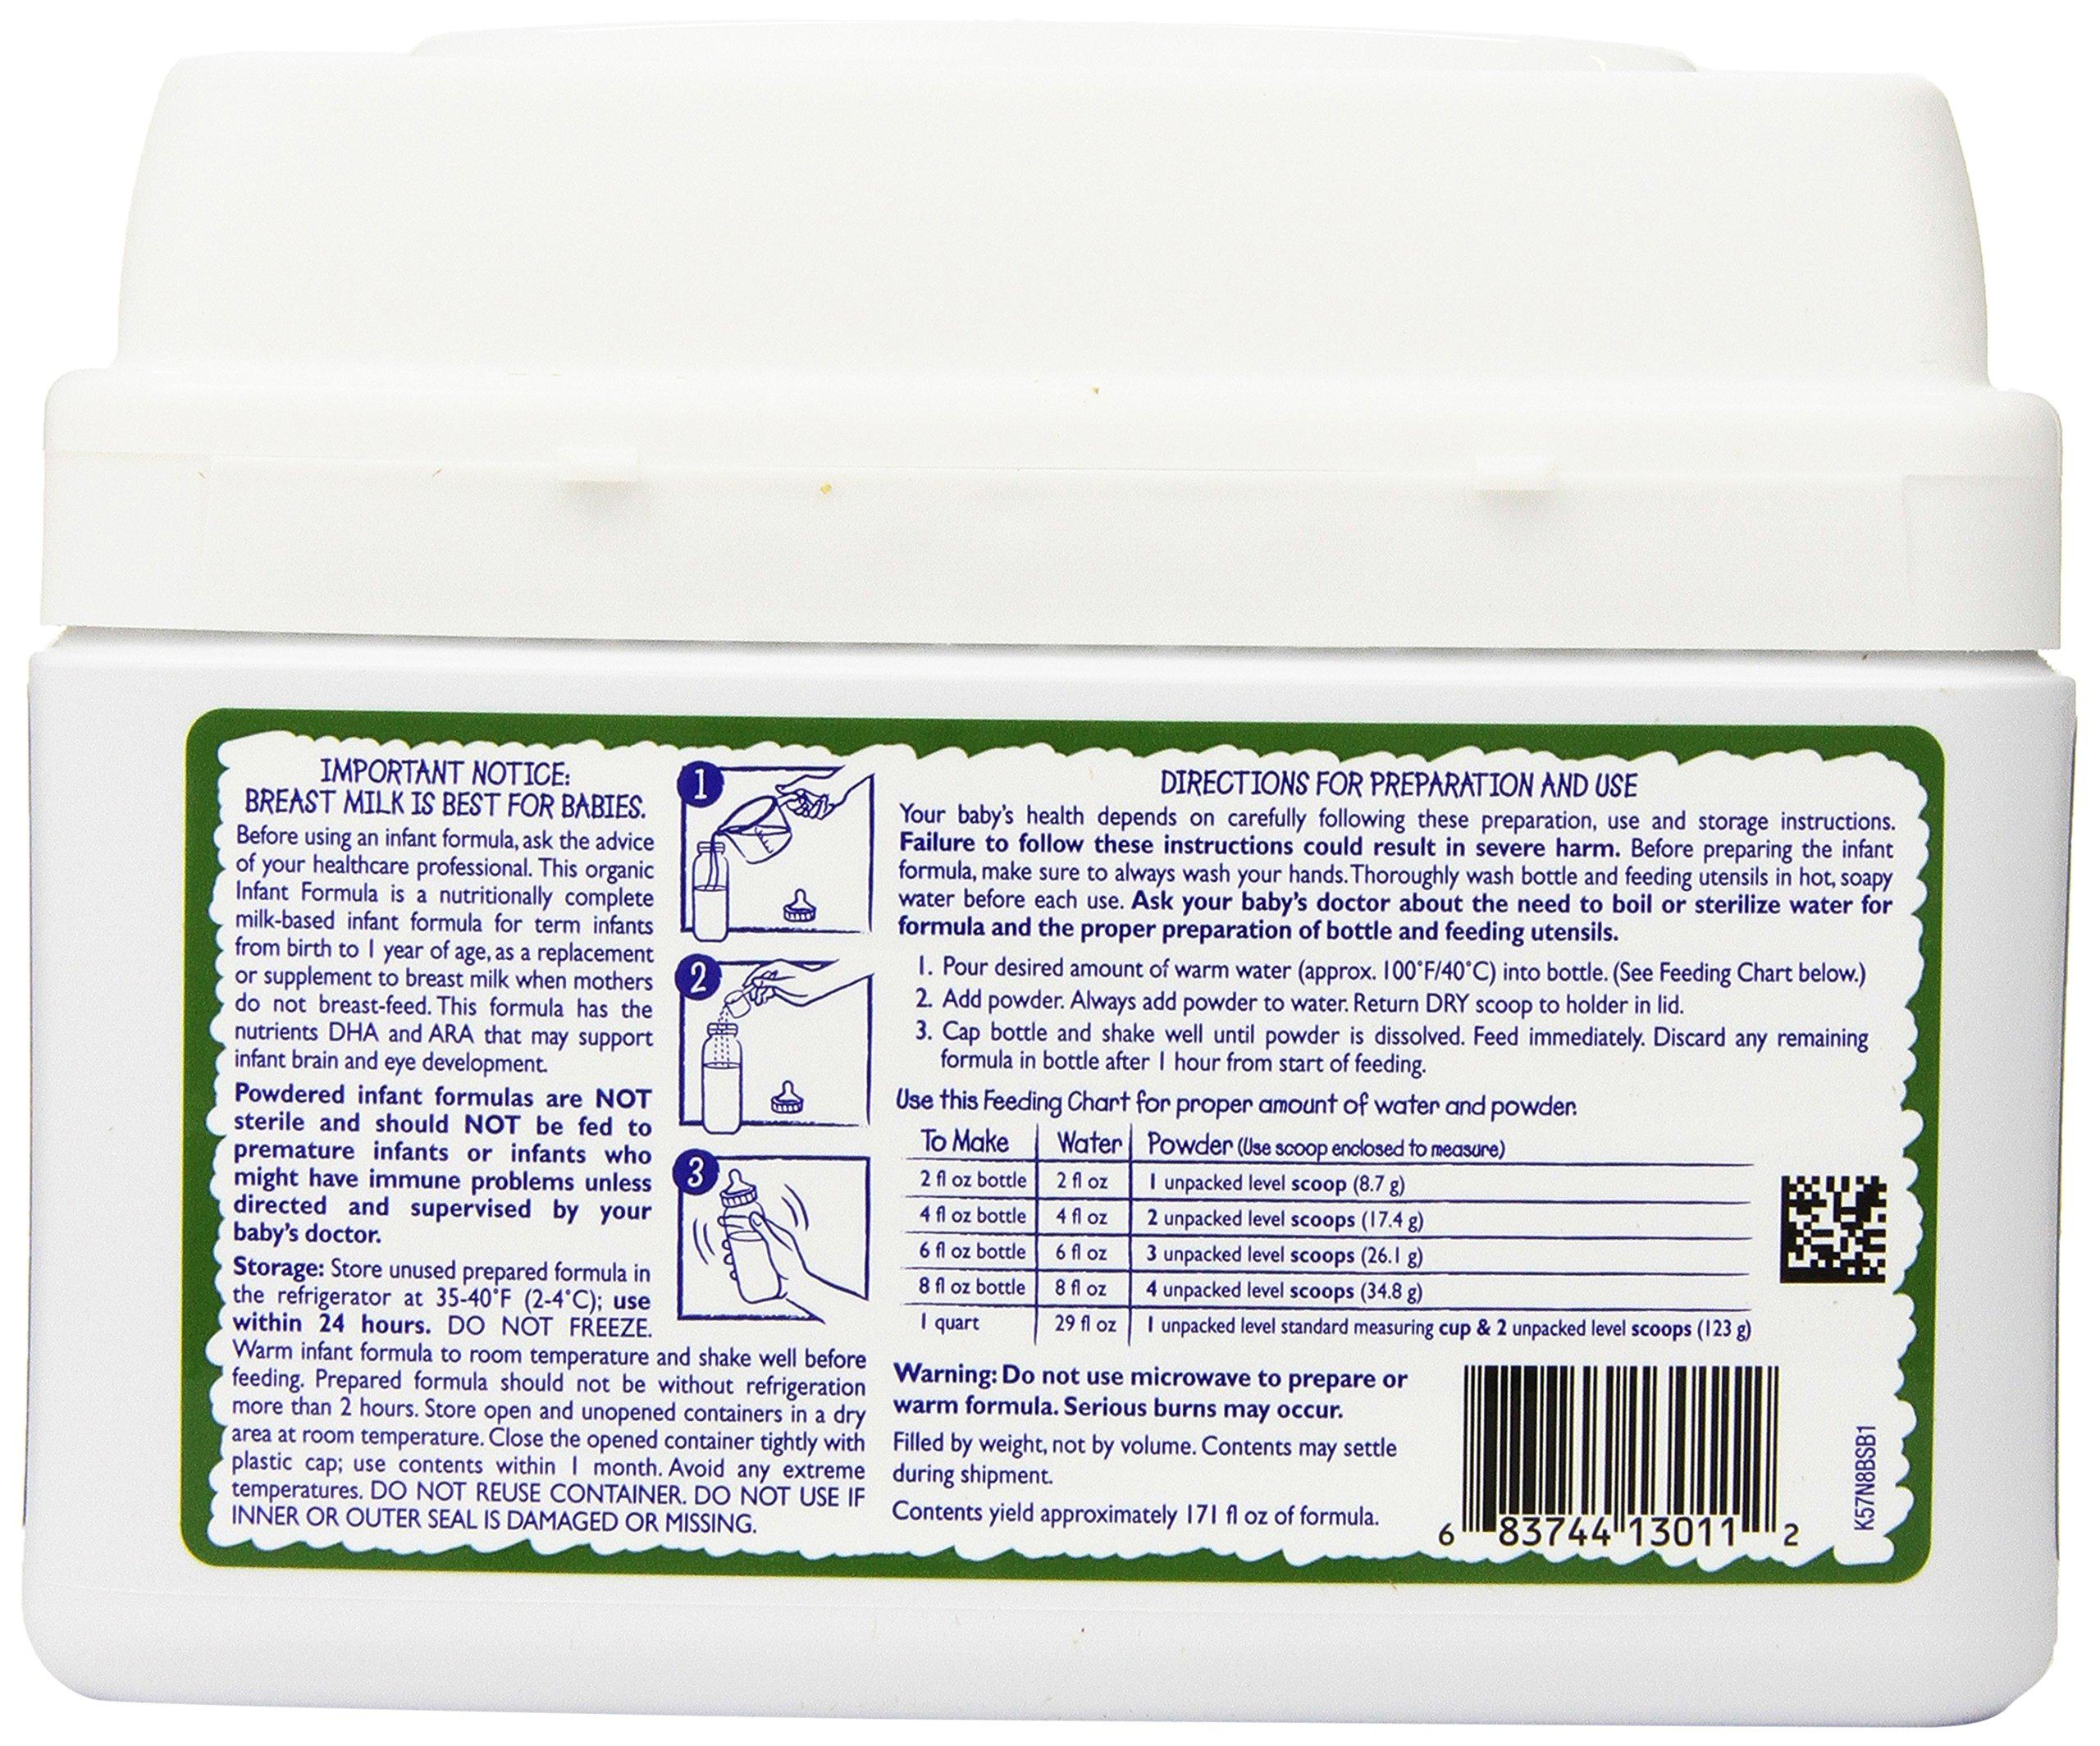 Vermont Organics Milk-Based Organic Infant Formula with Iron, 23.2 oz.  (Pack of 4) by Vermont Organics (Image #5)